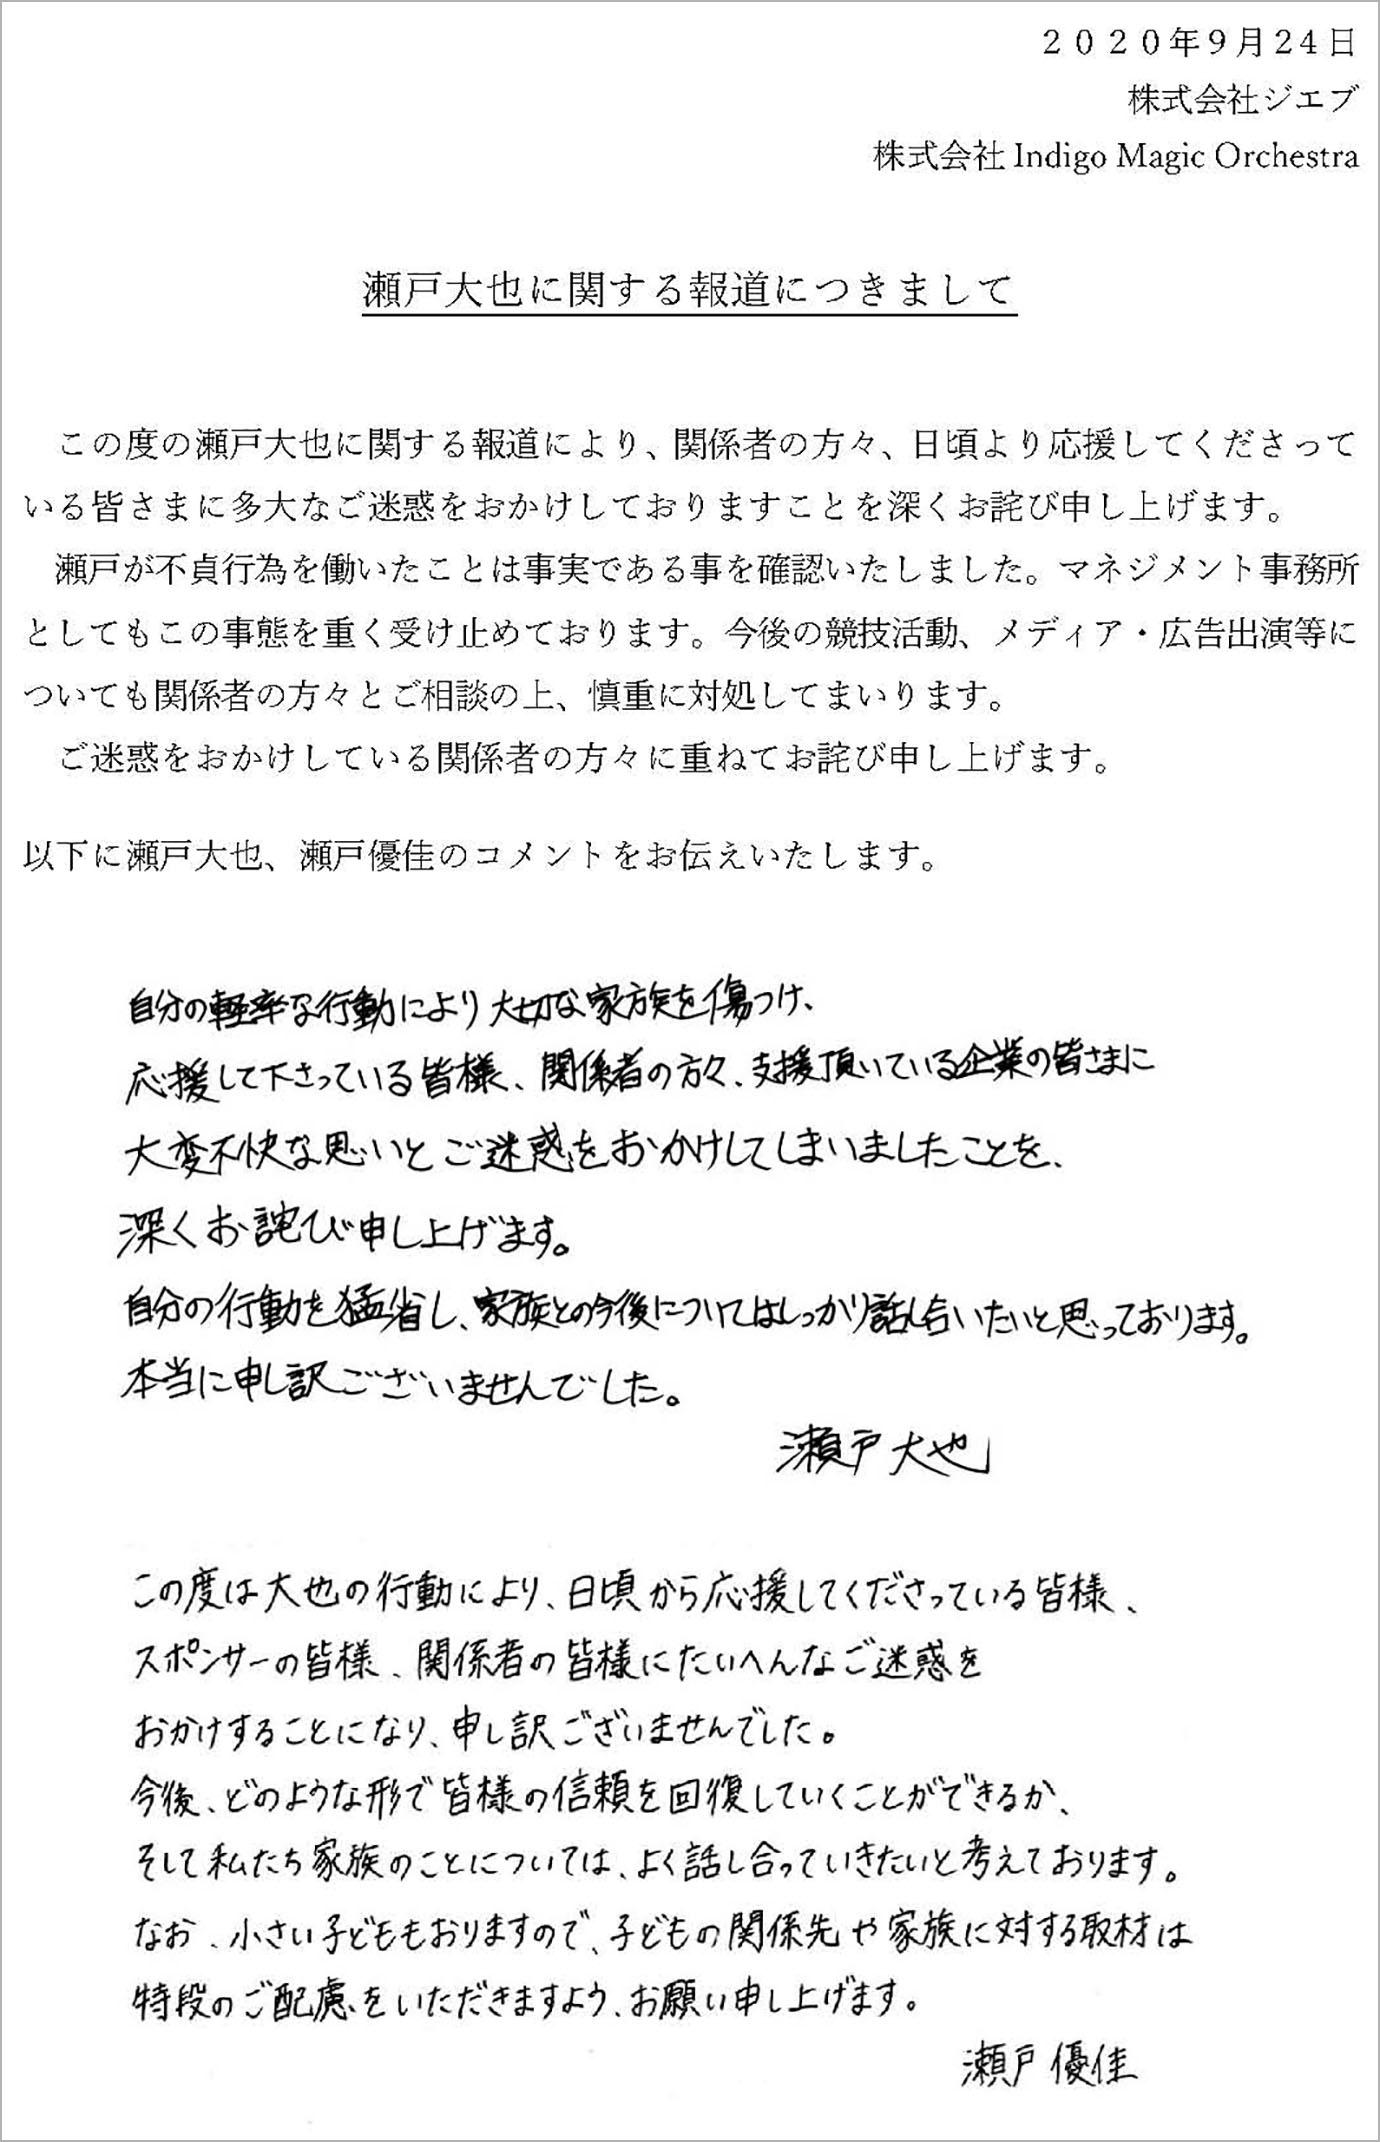 seto-daiya1